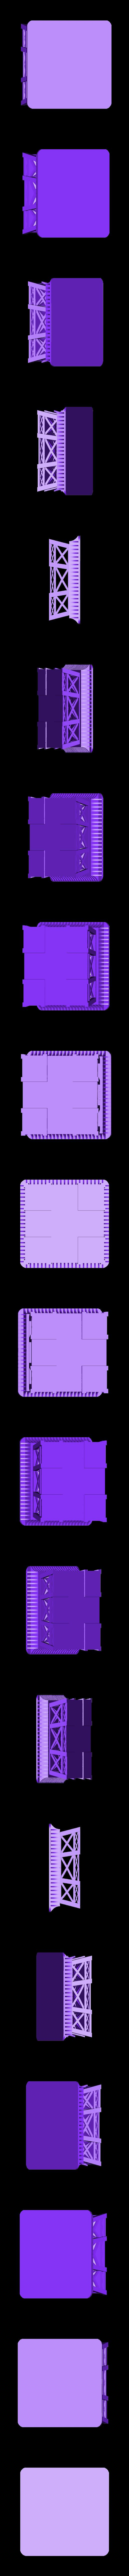 EiffelTower_part_D1.stl Download free STL file Eiffel Tower tricolor • 3D printable object, jteix